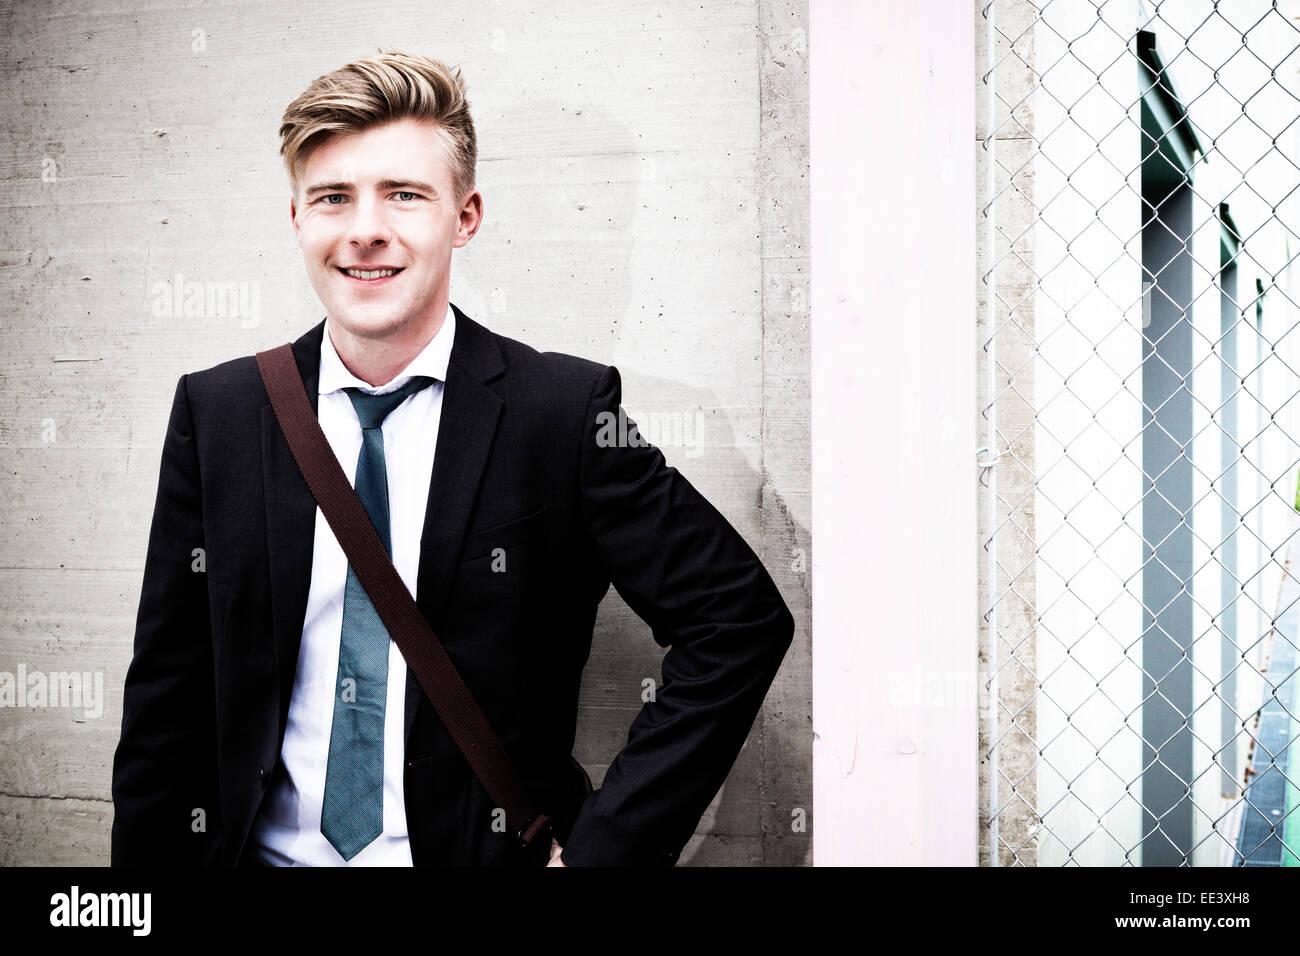 Portrait of young businessman, Munich, Bavaria, Germany - Stock Image